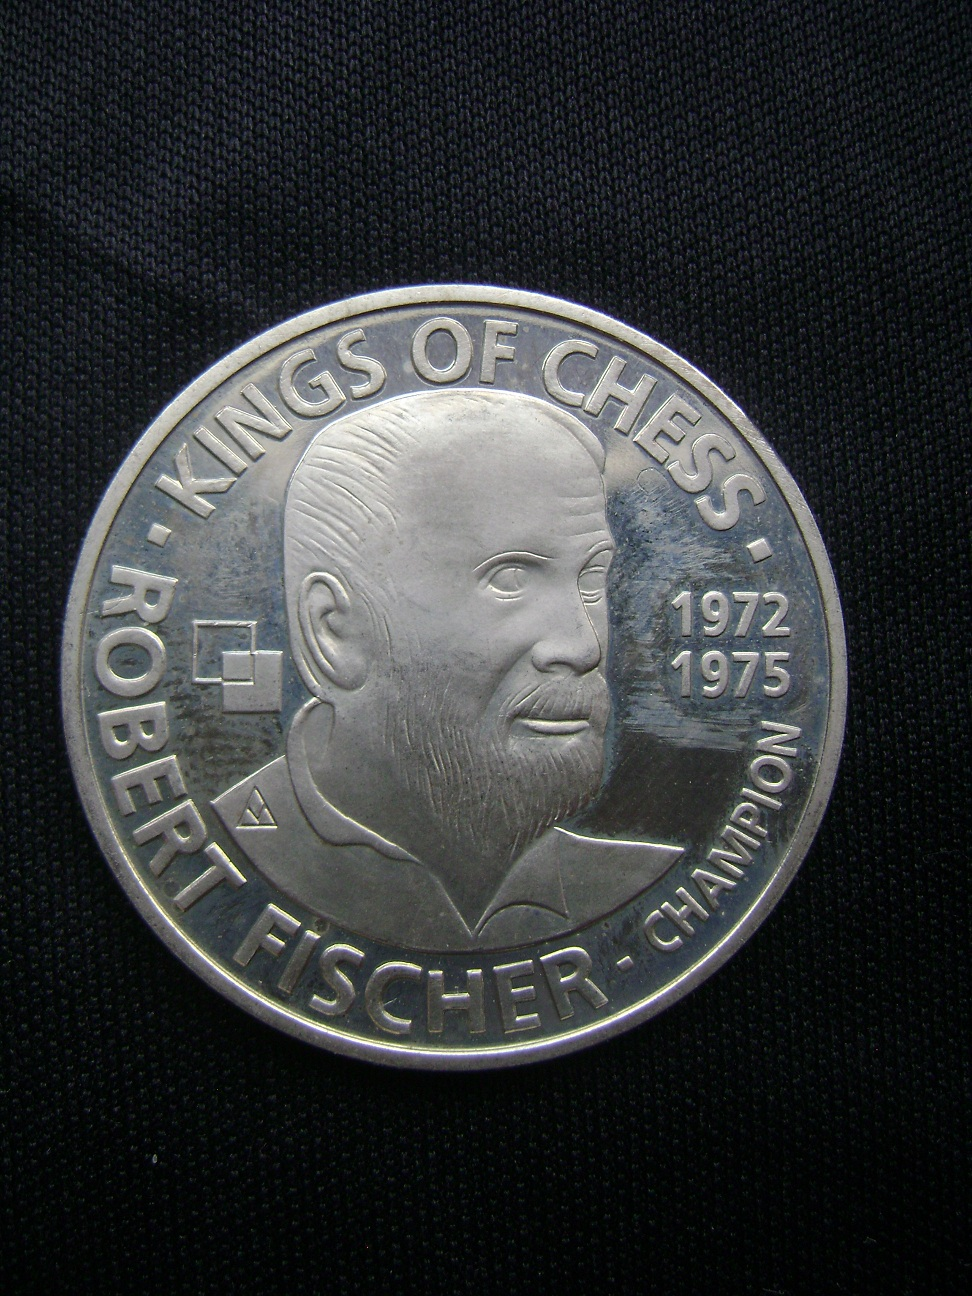 Coin_Bobi_Fiser_Kralj_saha_1.JPG